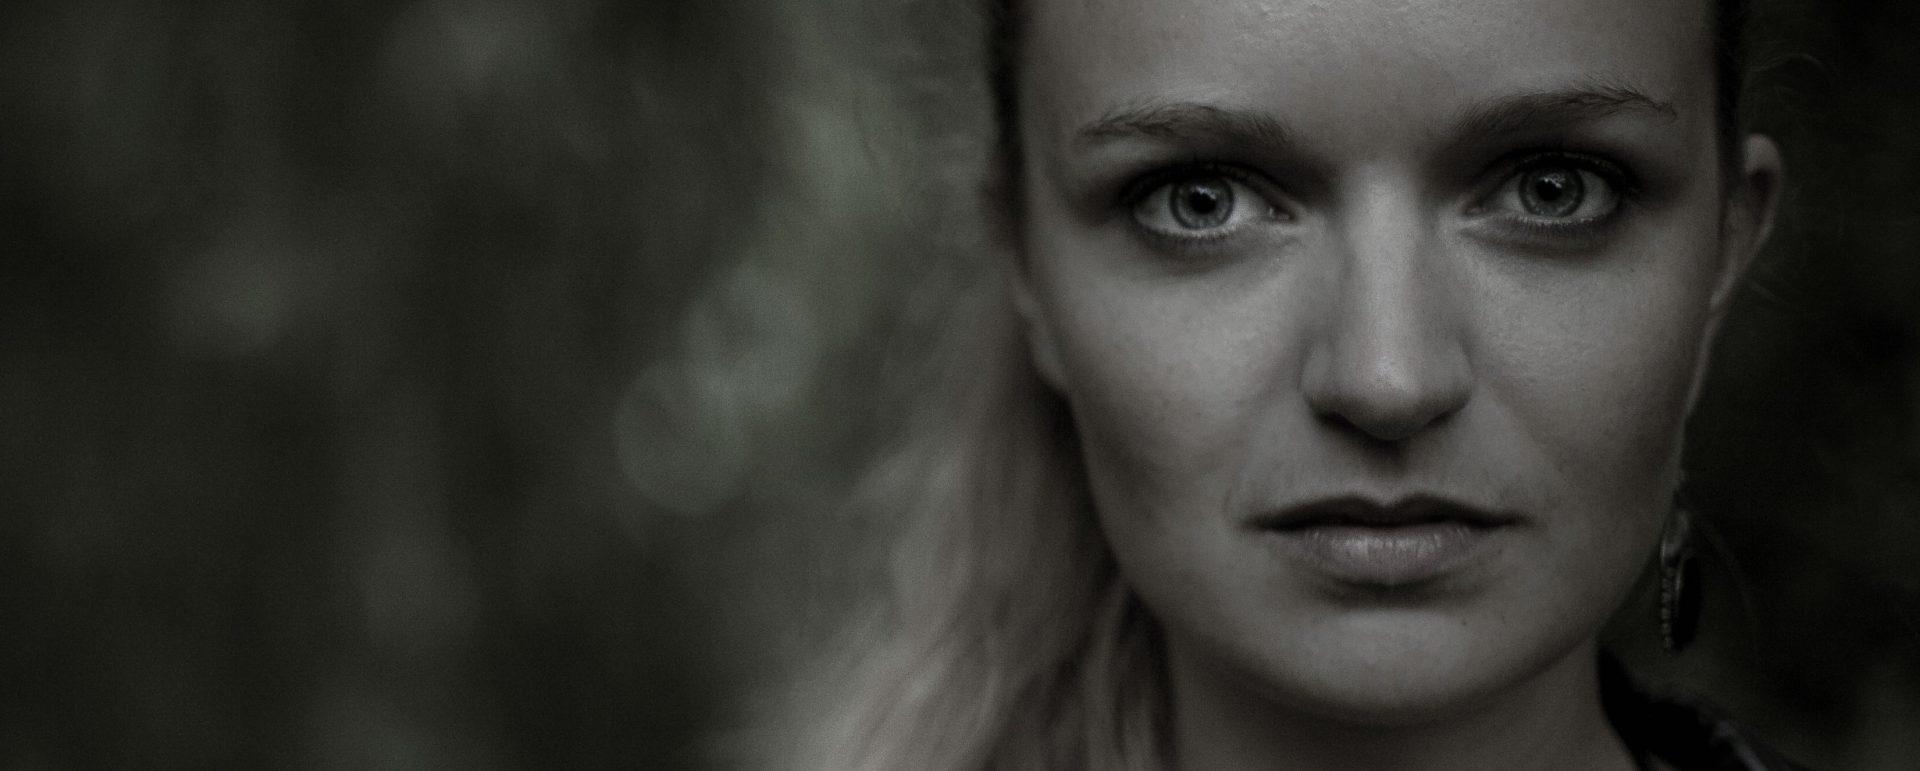 Astrid Engberg